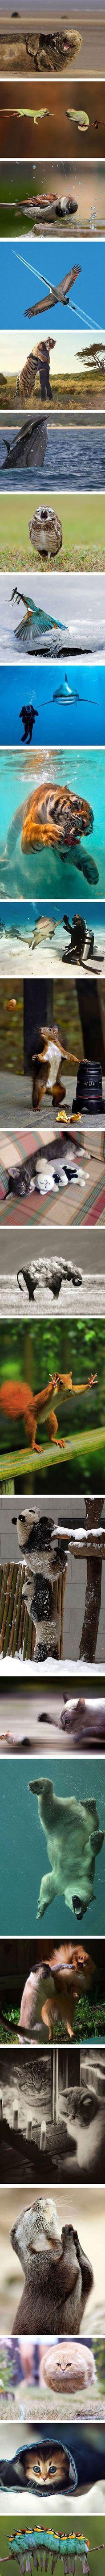 24 More Perfectly Timed Animal Photos - TechEBlog